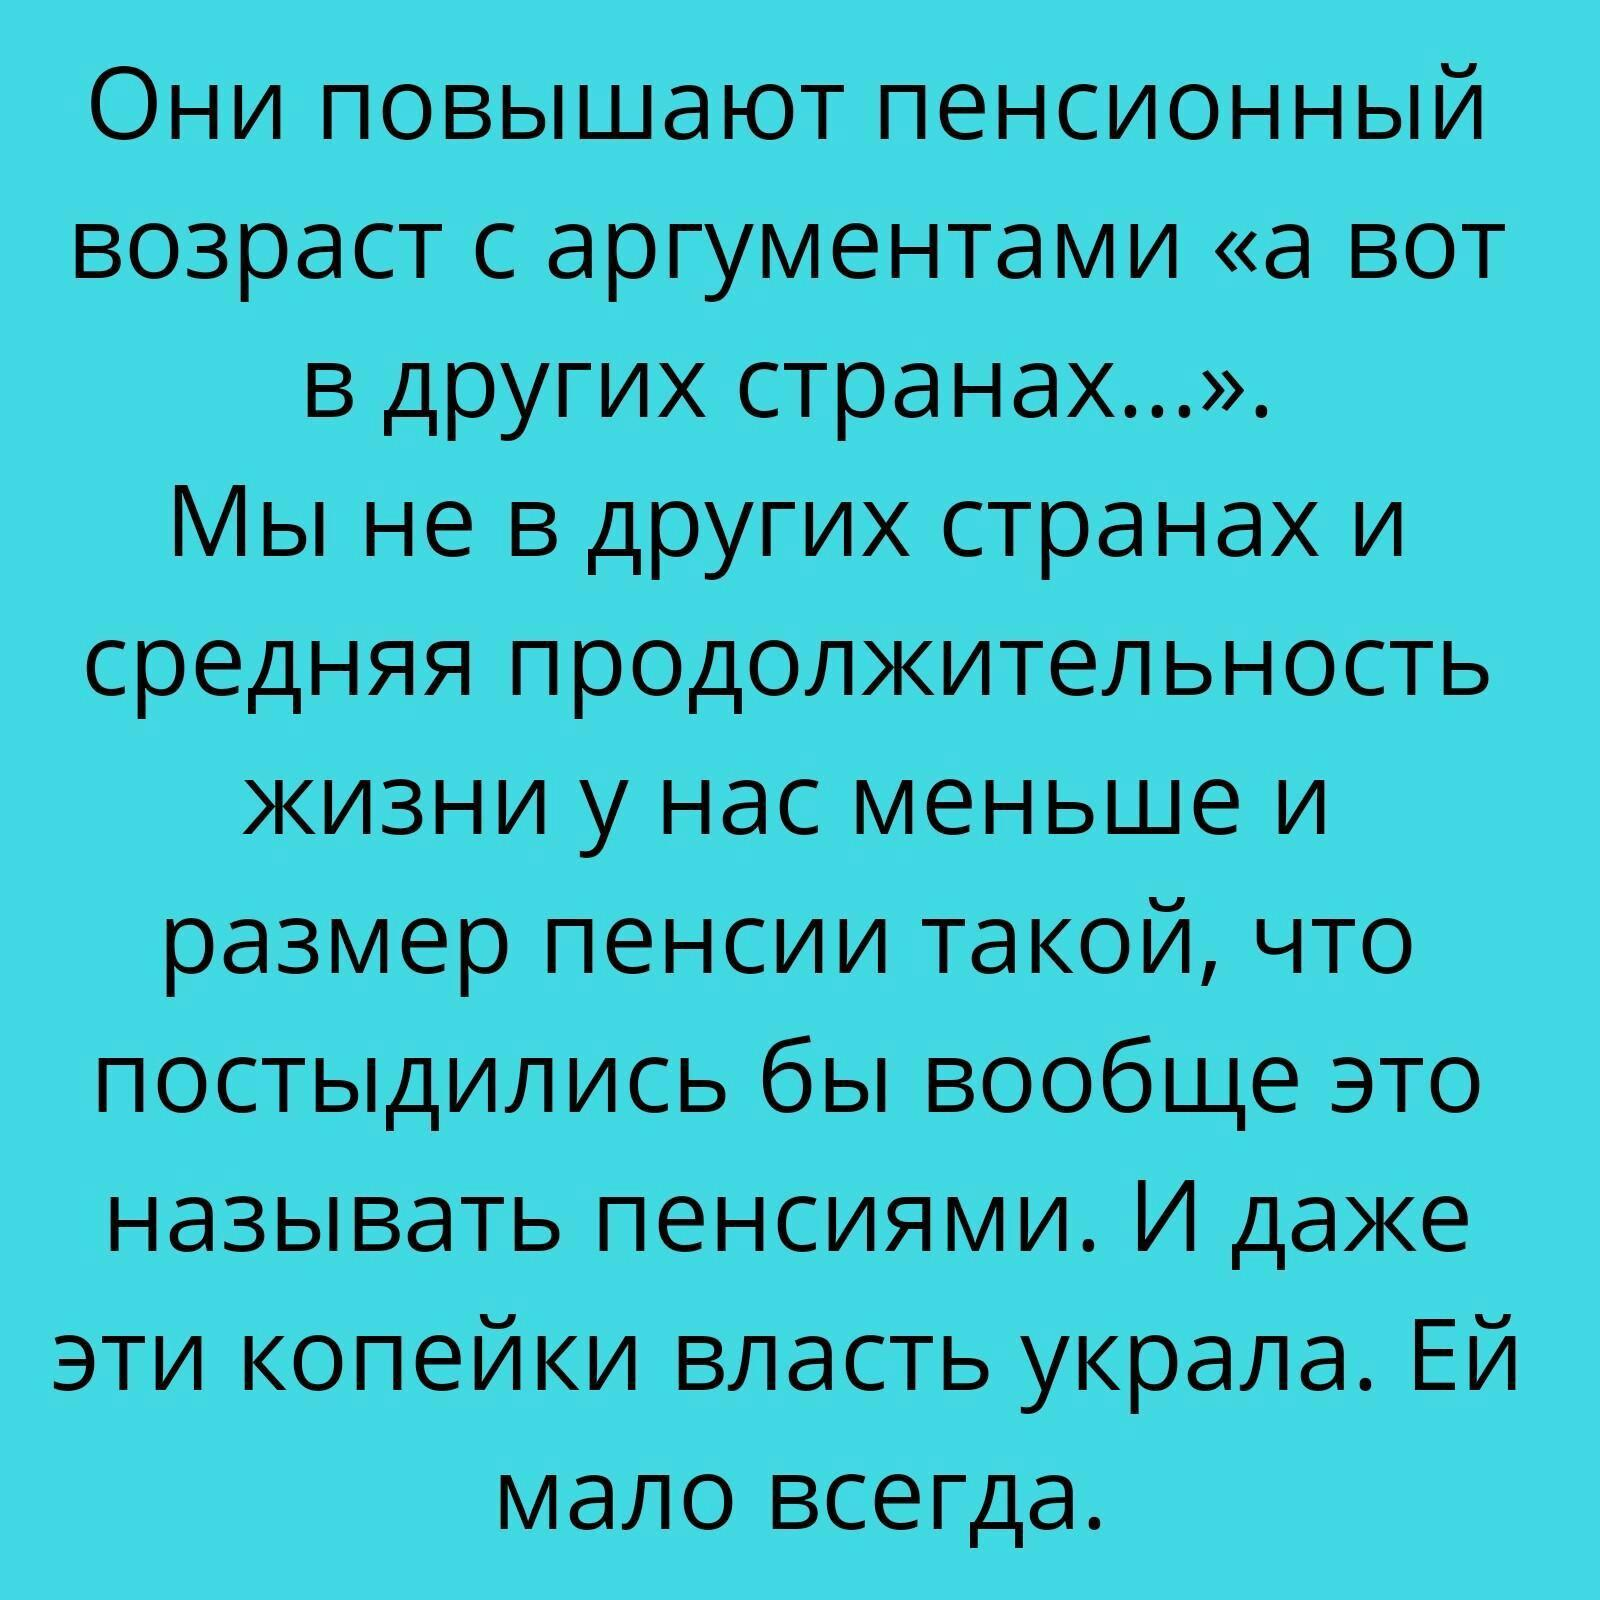 https://pp.userapi.com/c847019/v847019388/90aa4/XPPmfQO9Vqc.jpg